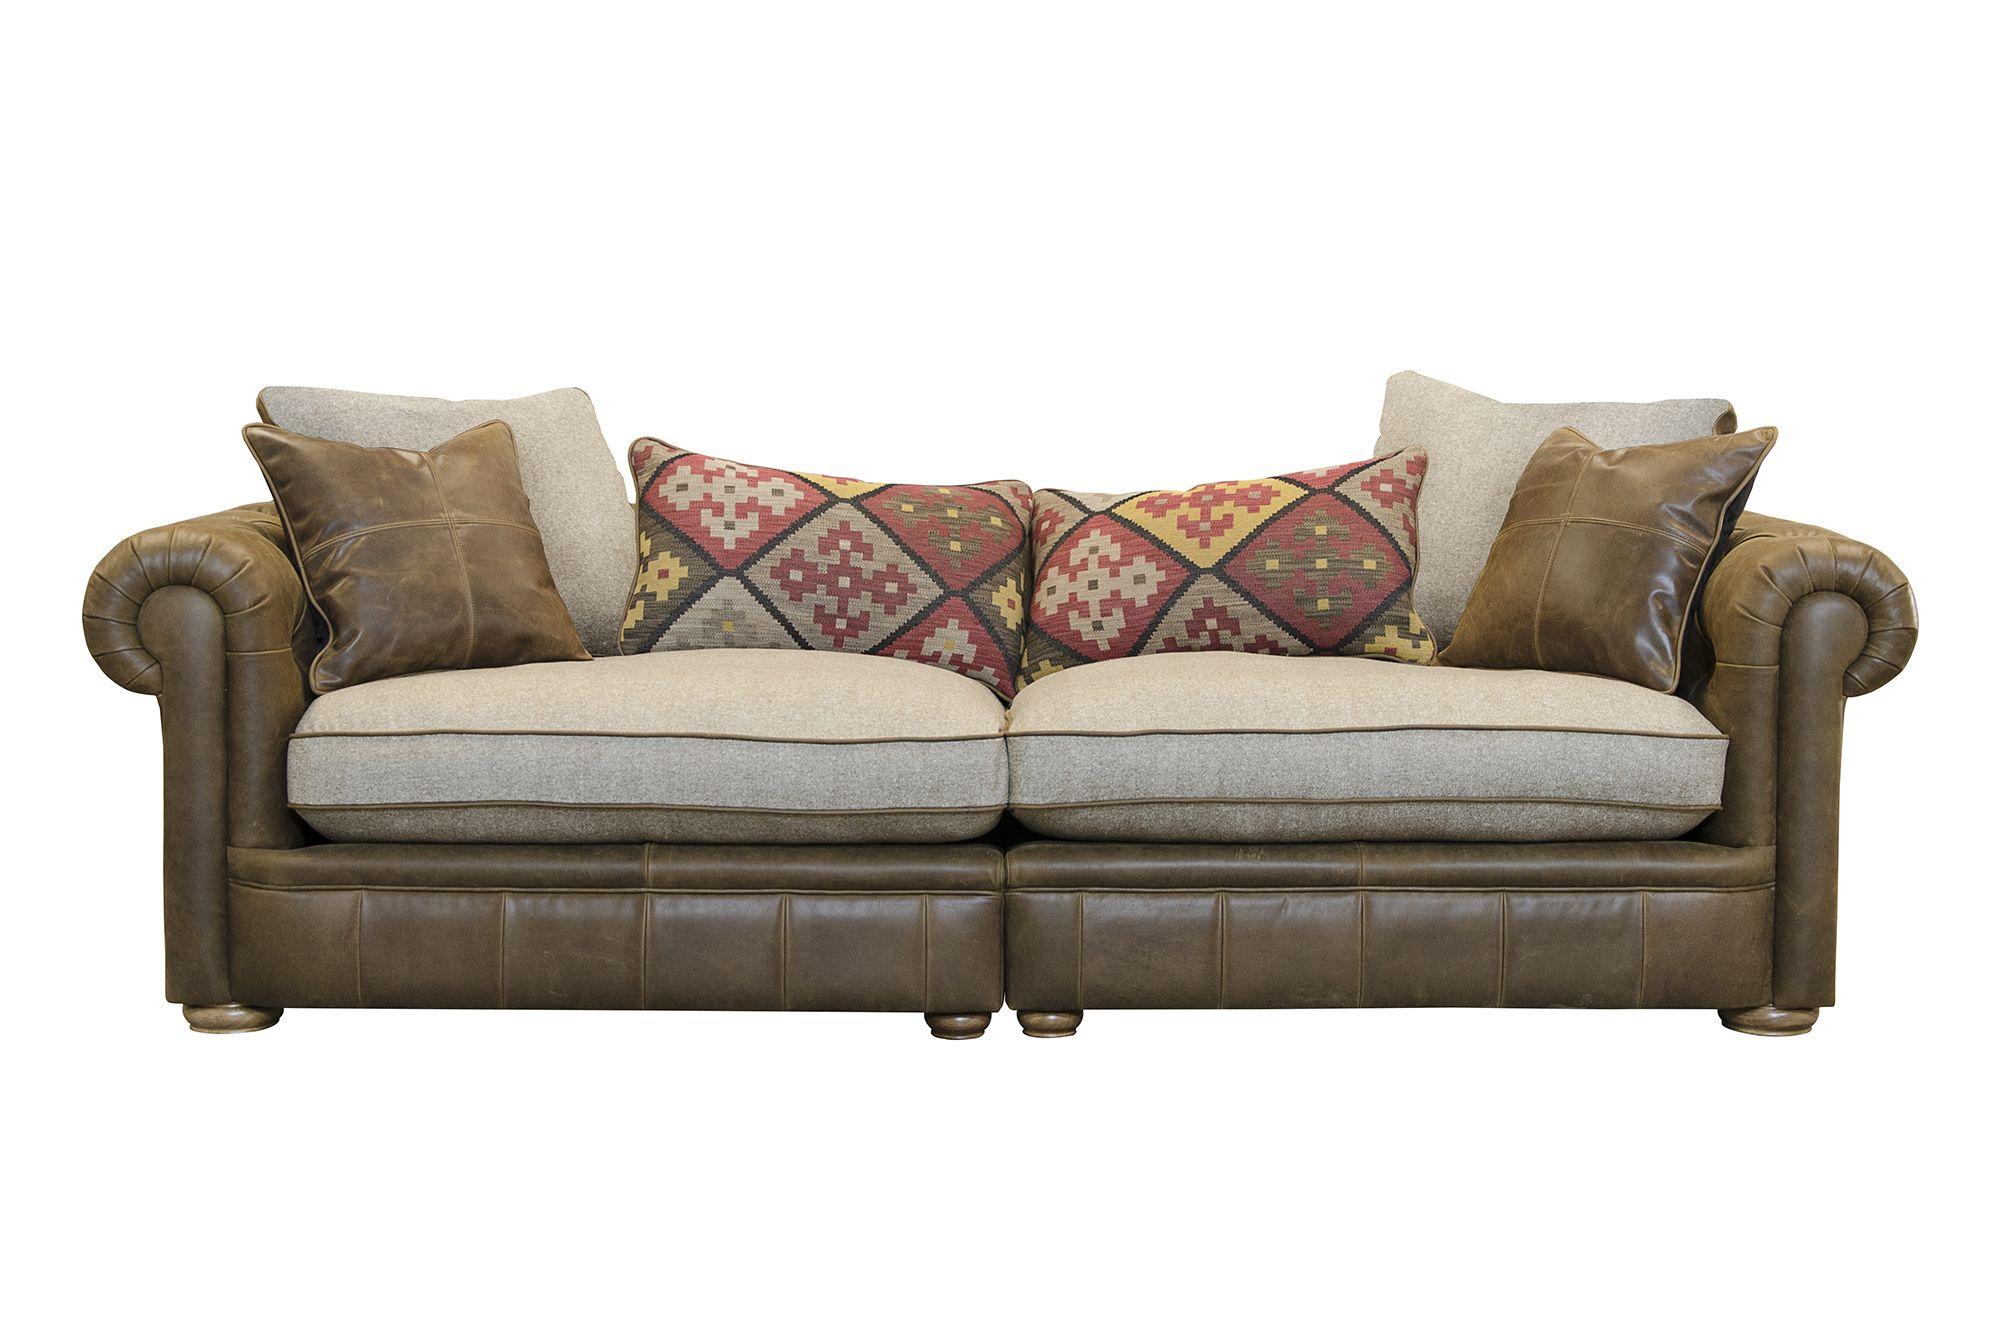 Groovy Alexander James The Retreat Maxi Sofa Leather Jin Brown Machost Co Dining Chair Design Ideas Machostcouk